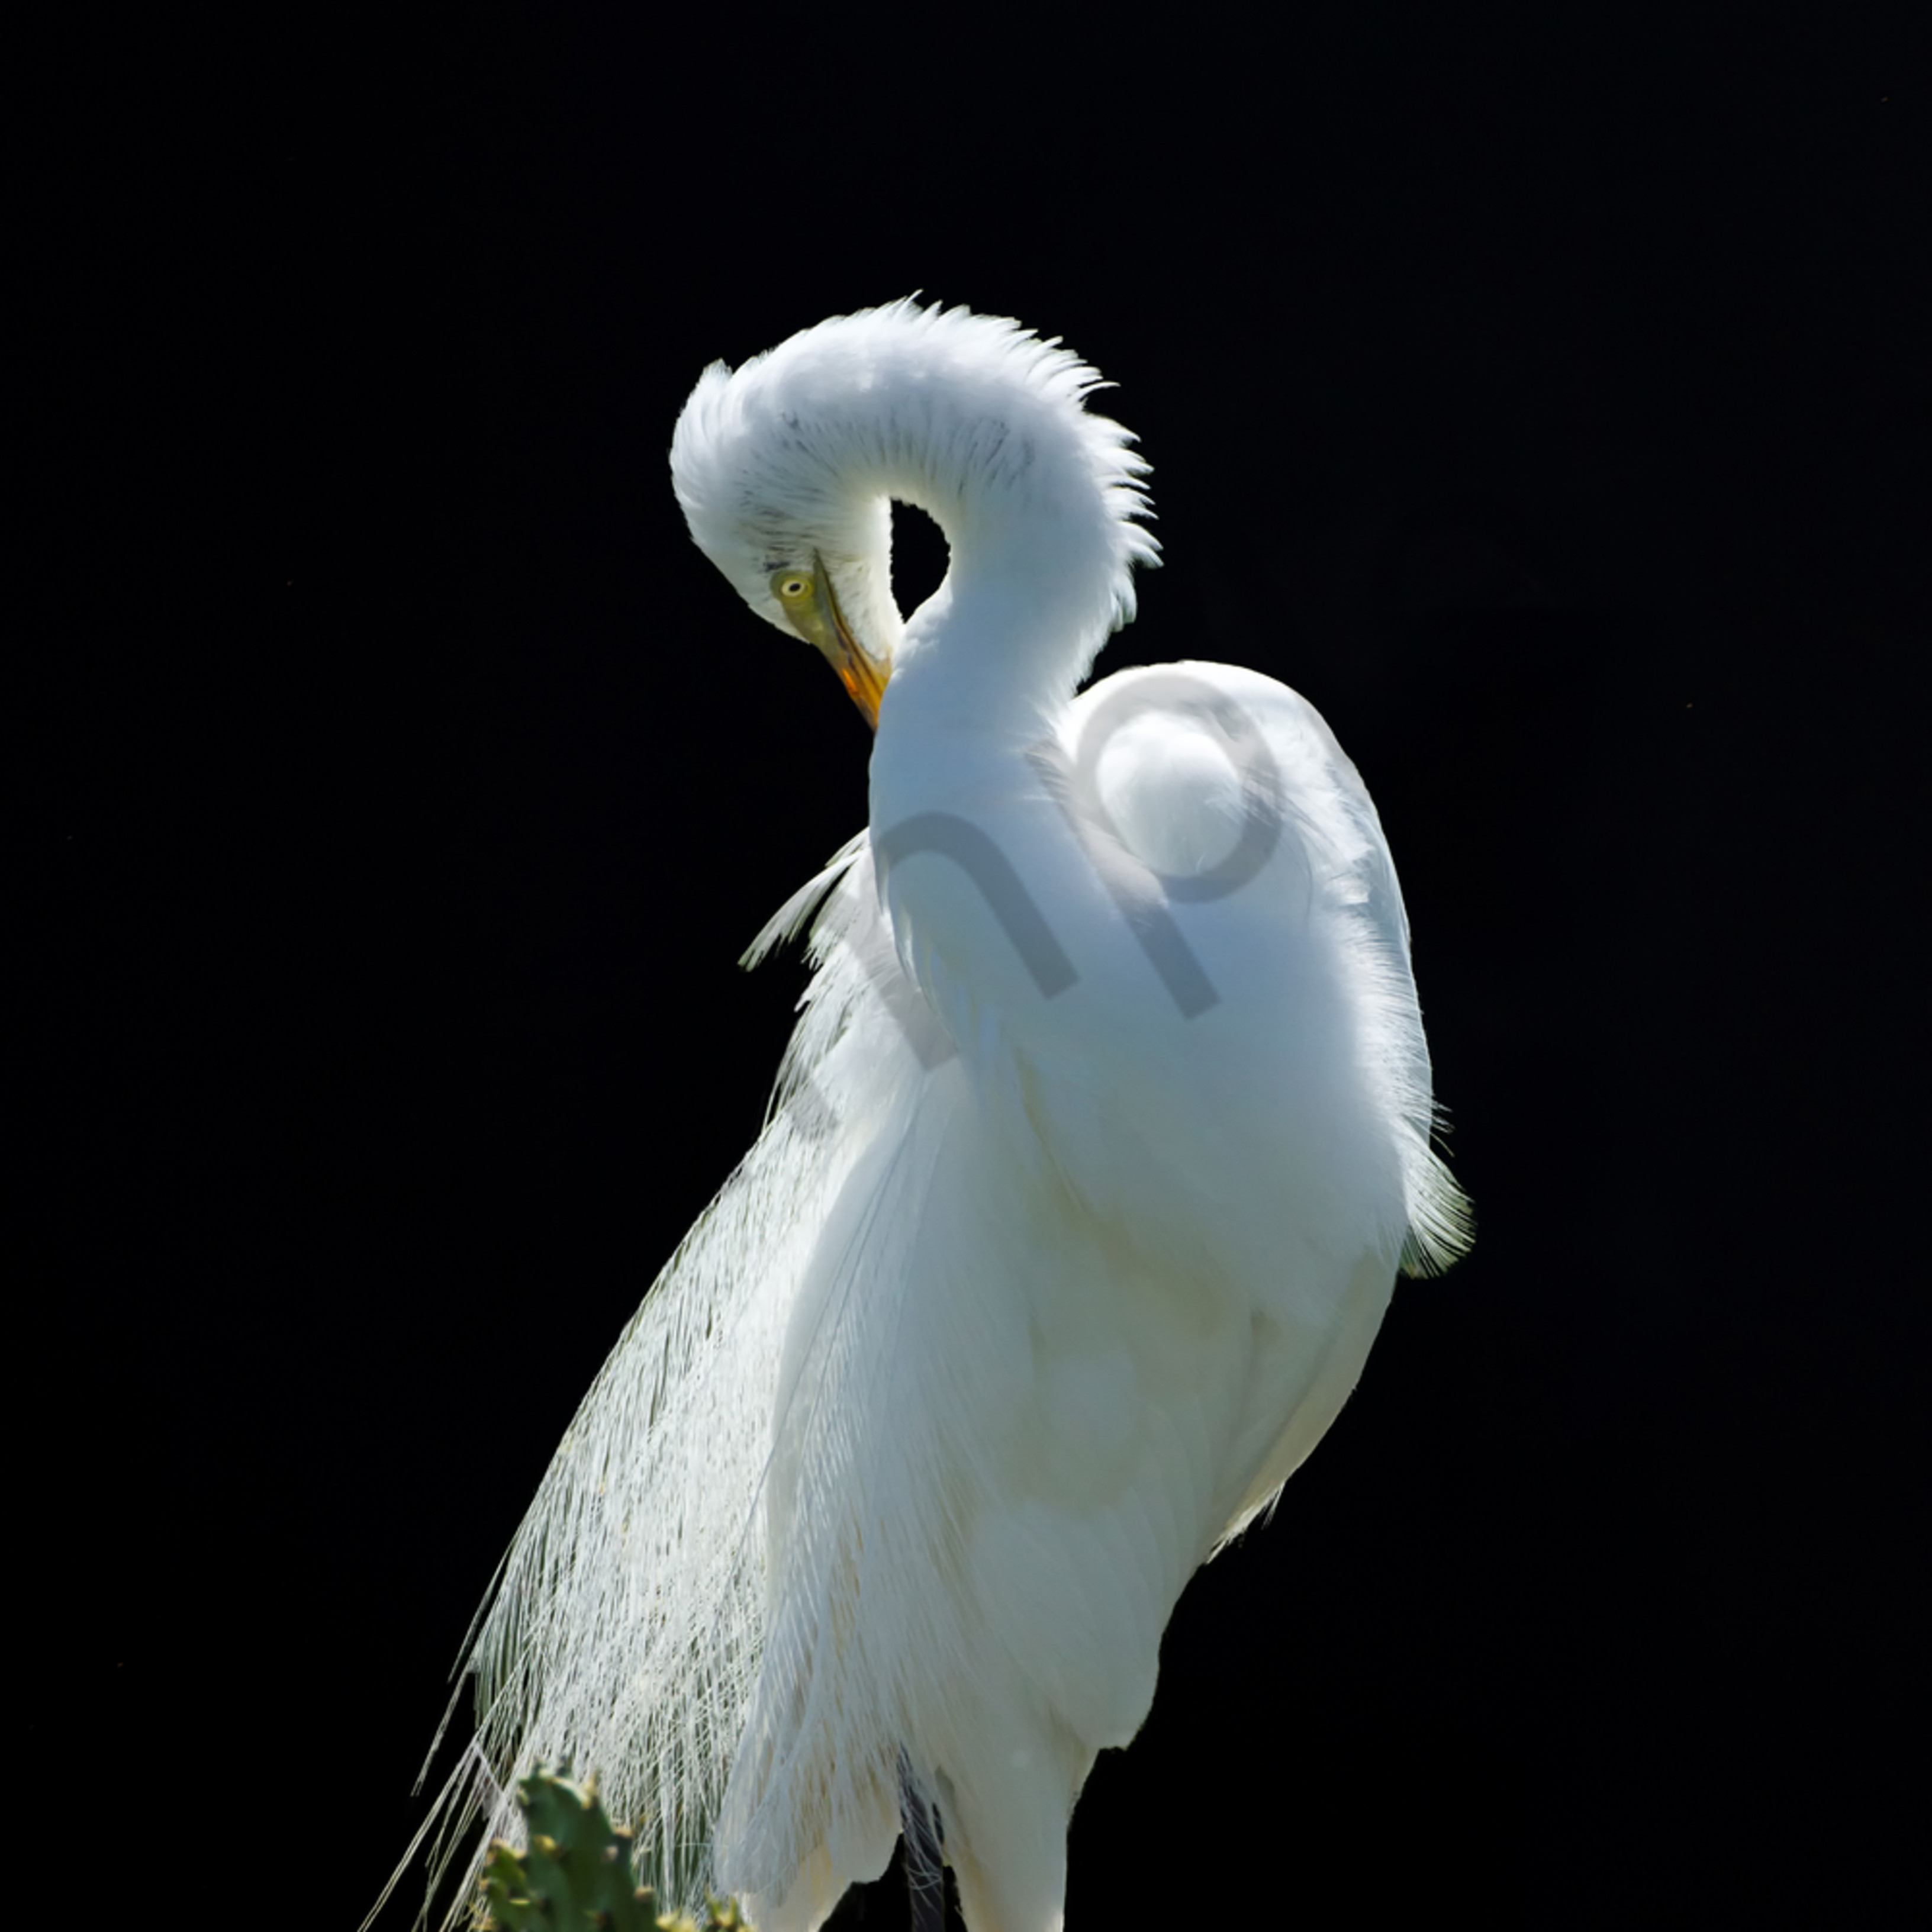 Moonlit egret 4.21.13 g9yrp1